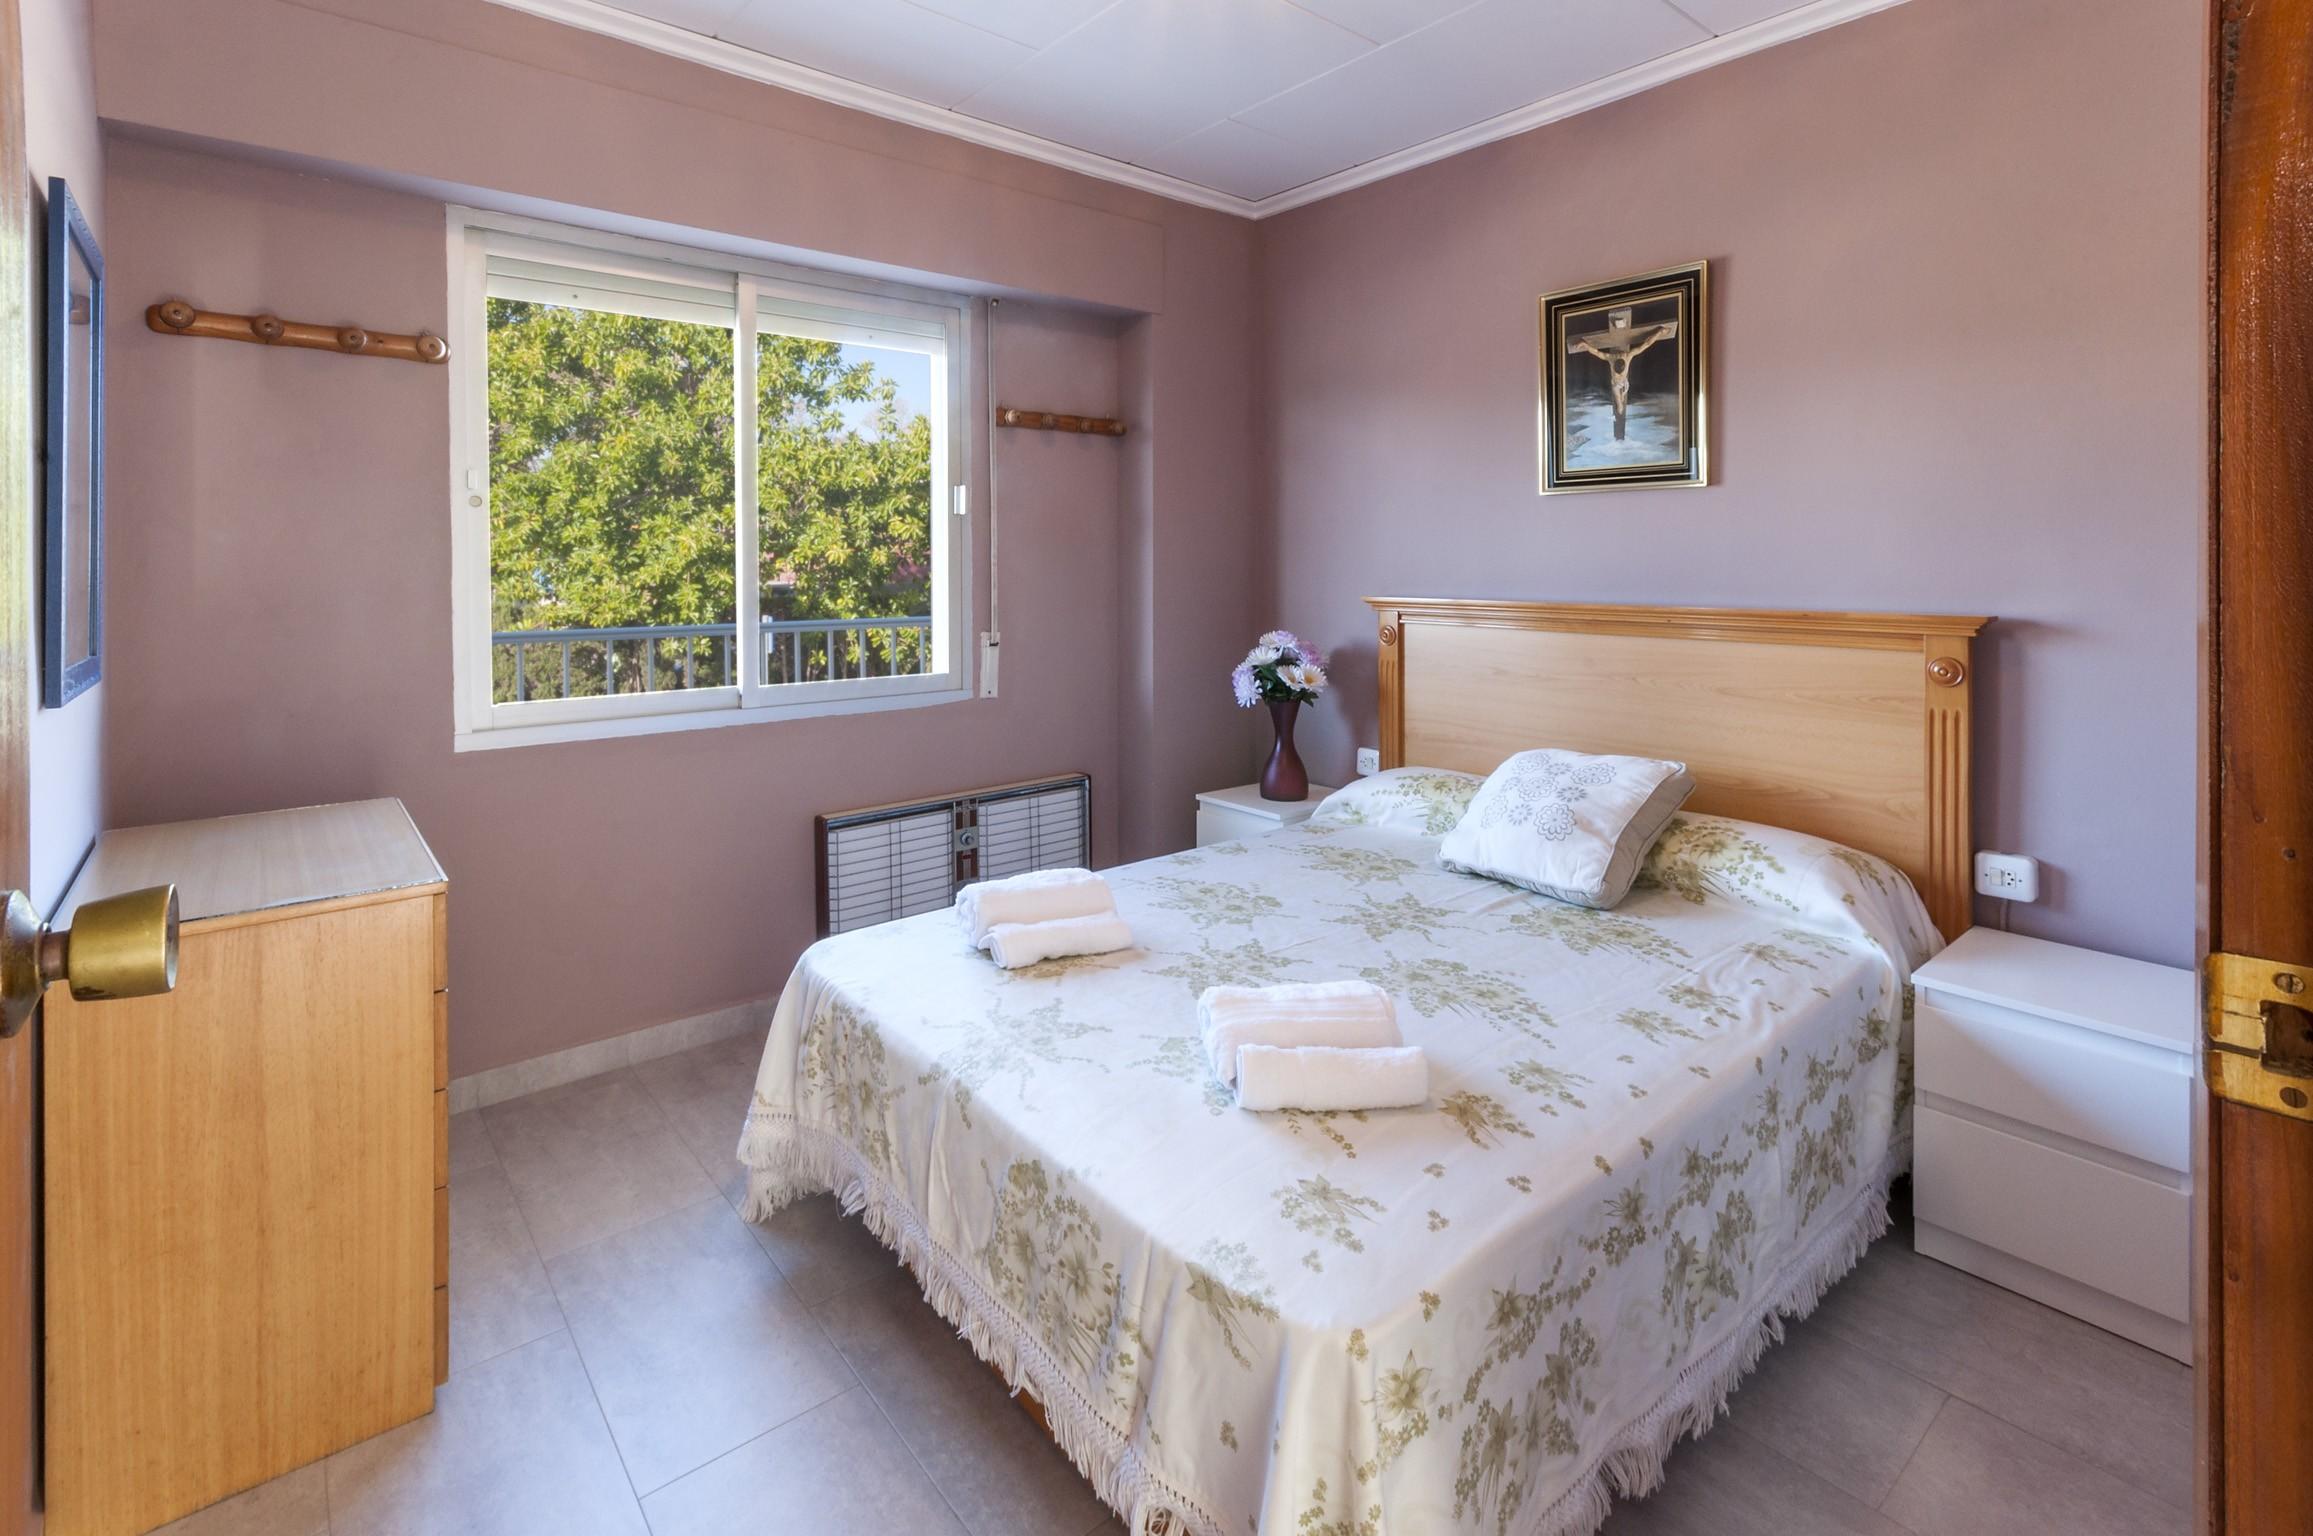 Ferienwohnung COTTON (2326755), Playa de Oliva, Costa de Valencia, Valencia, Spanien, Bild 10